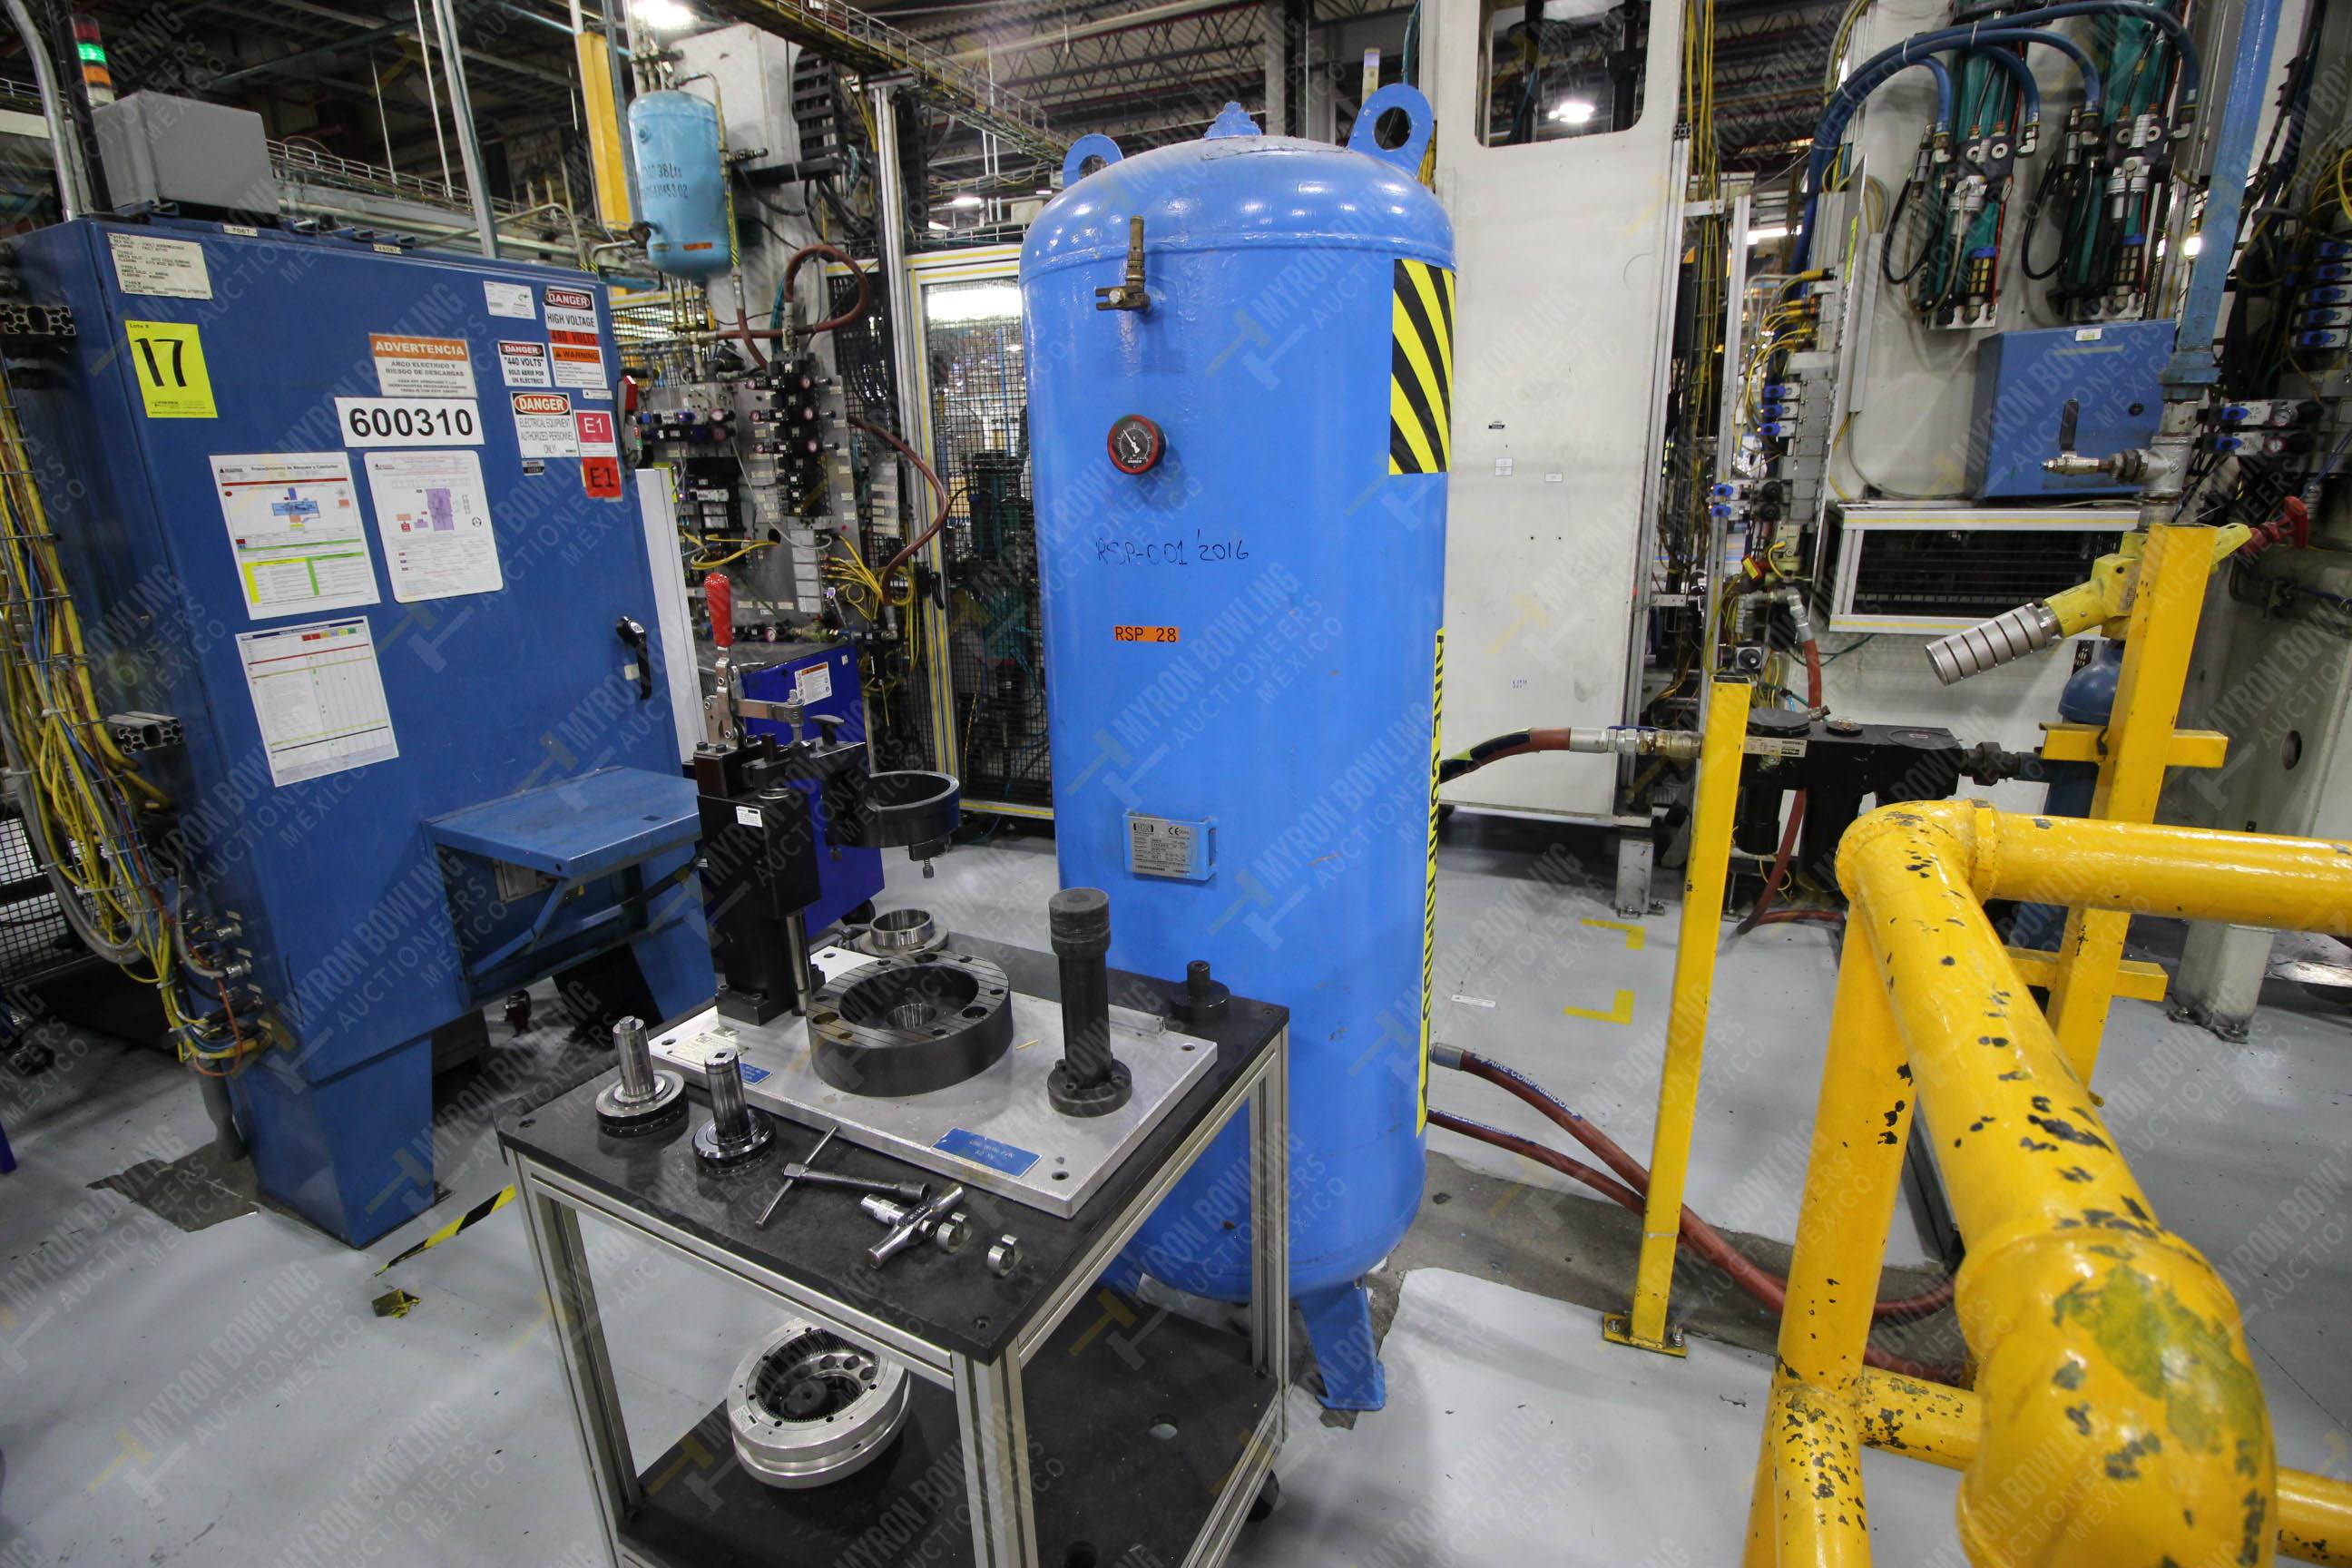 Estación semiautomática para operación 305D, contiene: Prensa tipo cuello de ganso con dos cilindros - Image 6 of 20